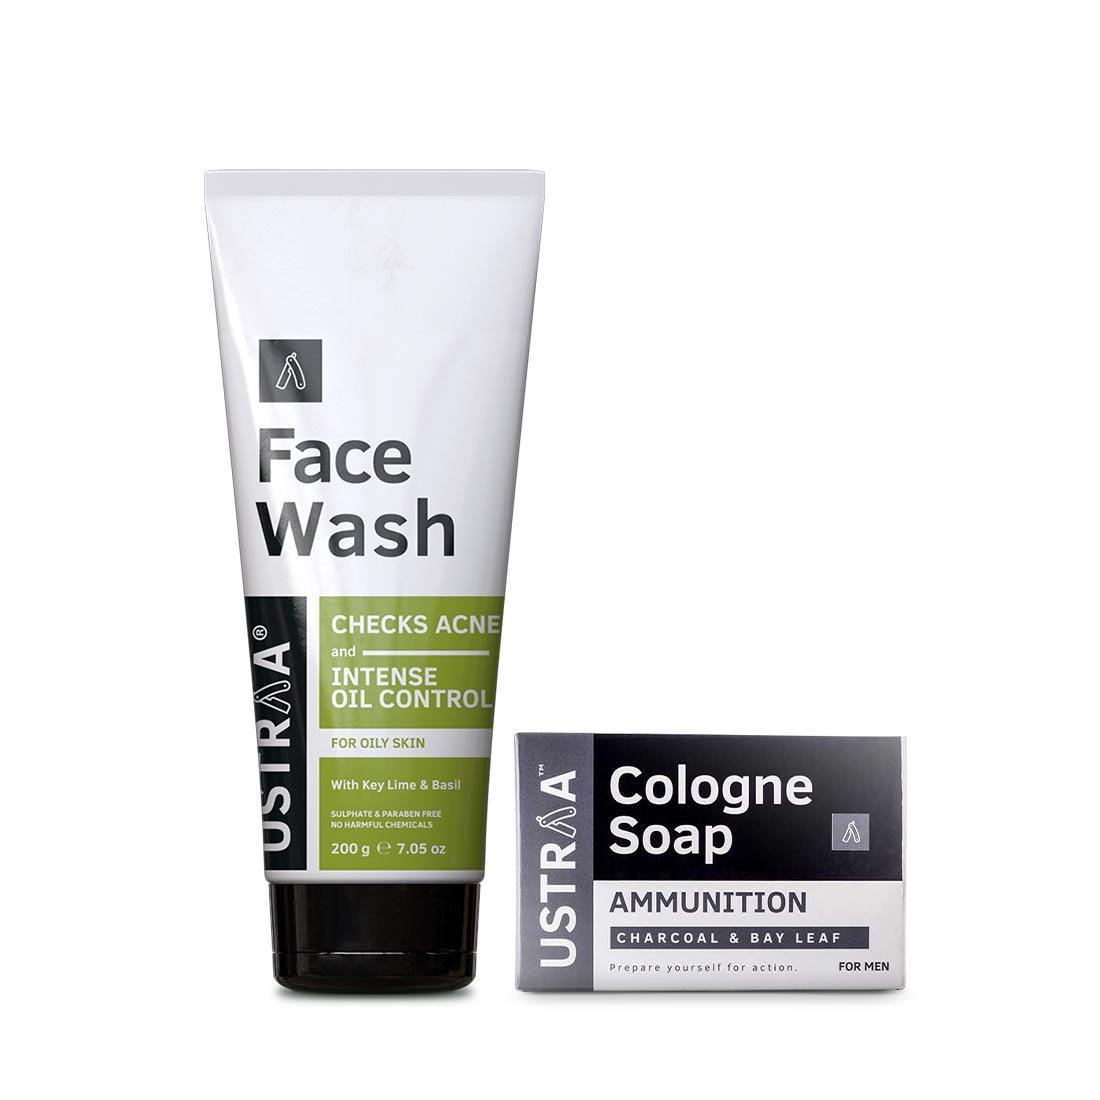 Face Wash - Oily Skin & Cologne Soap - Ammunition